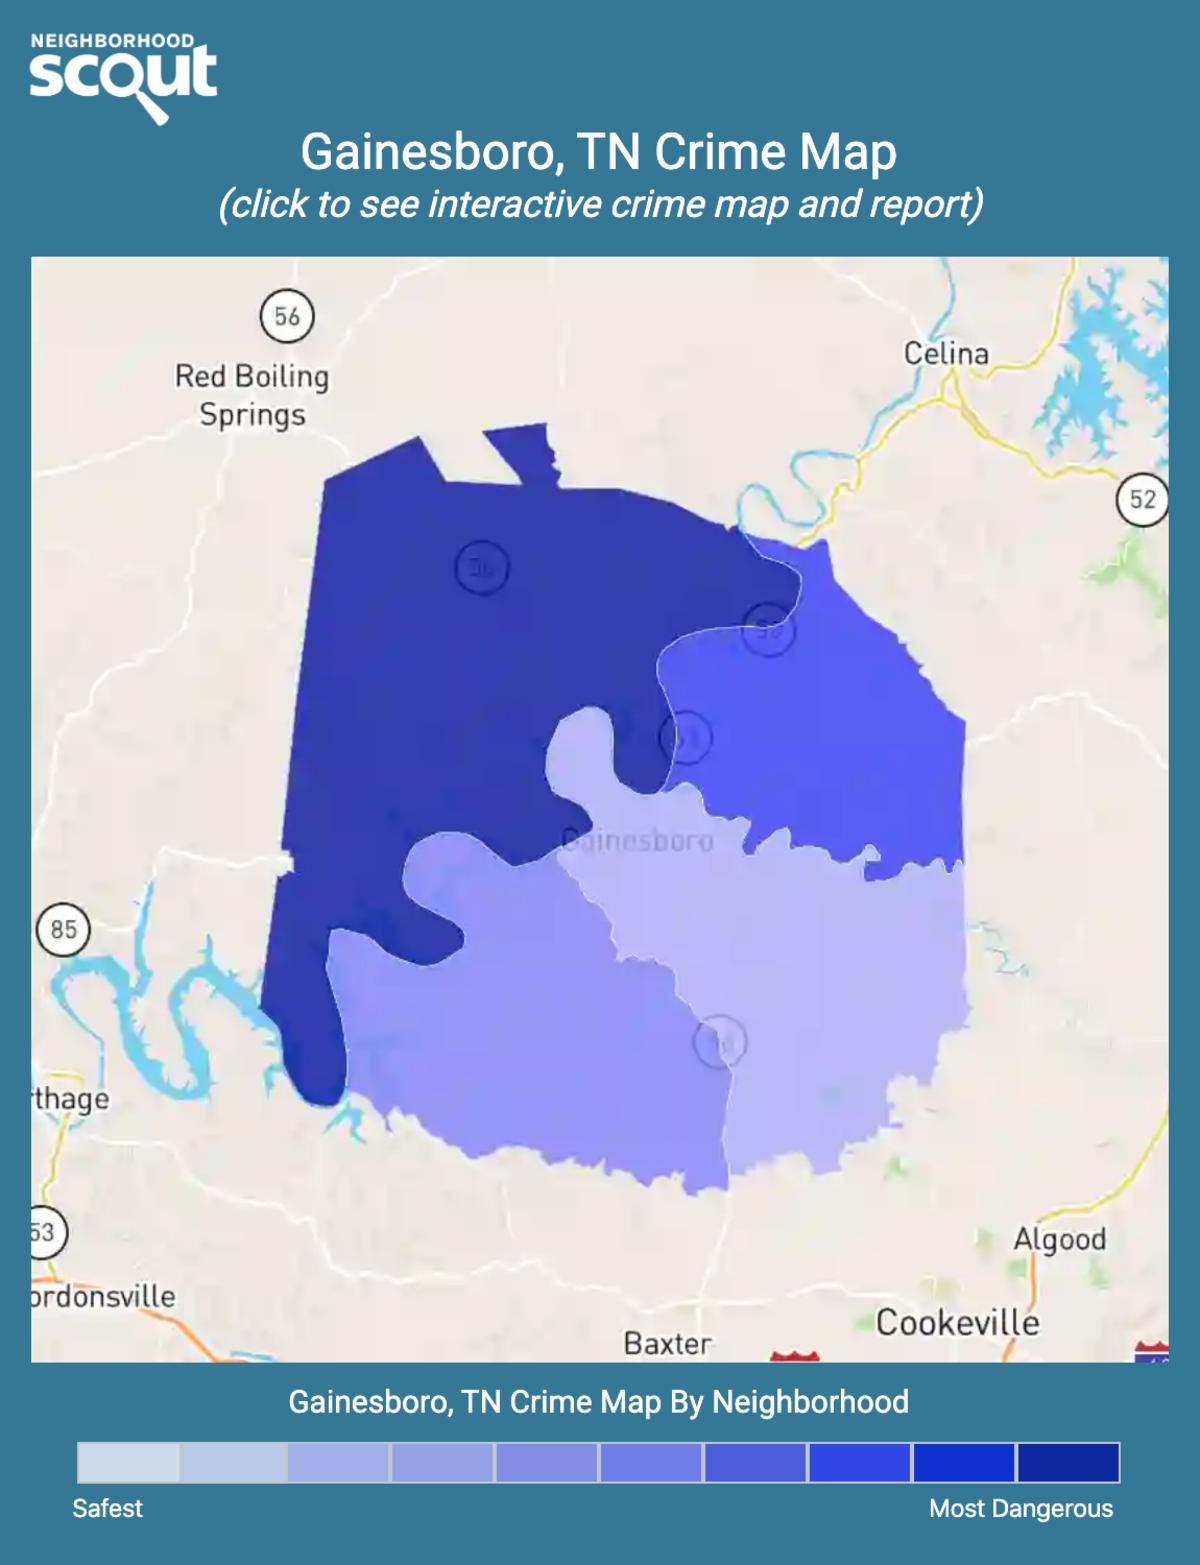 Gainesboro, Tennessee crime map